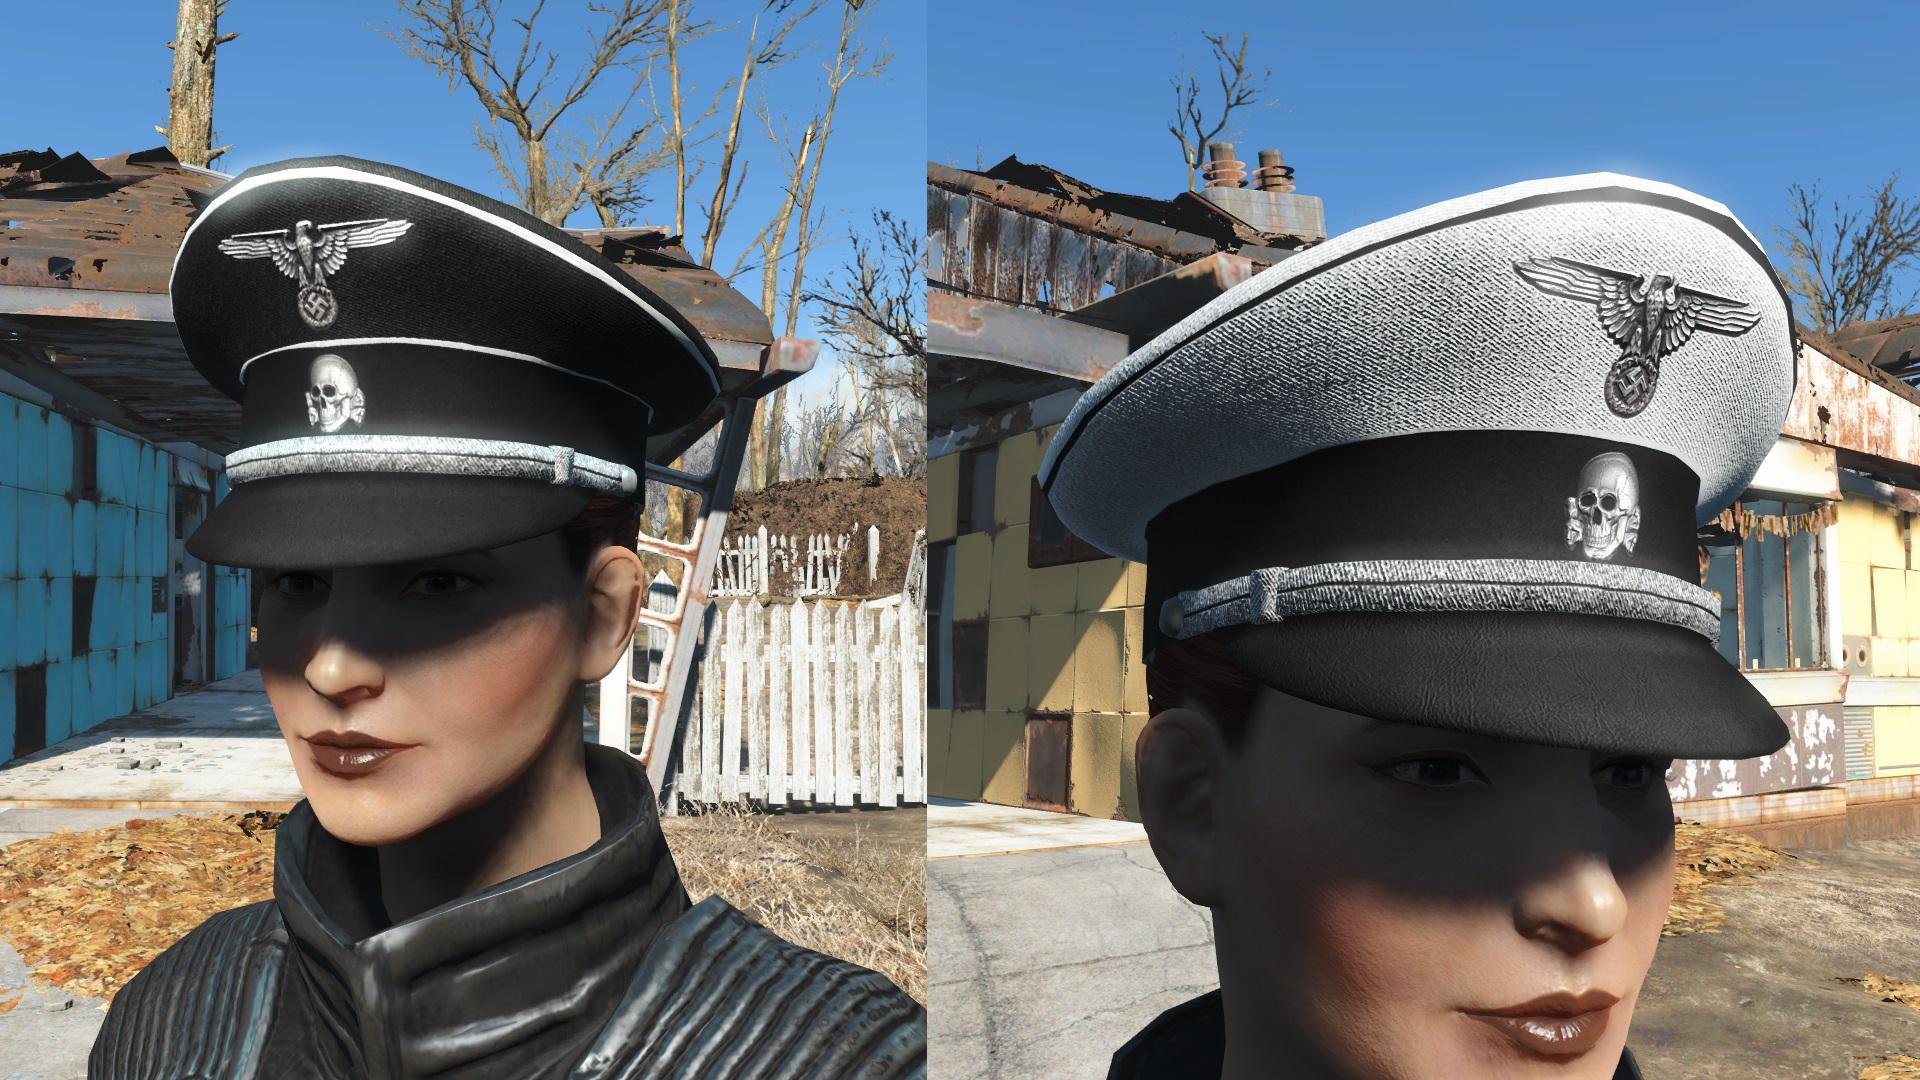 Schutzstaffel Ss 4k Black And White Cap Ww2 Blank